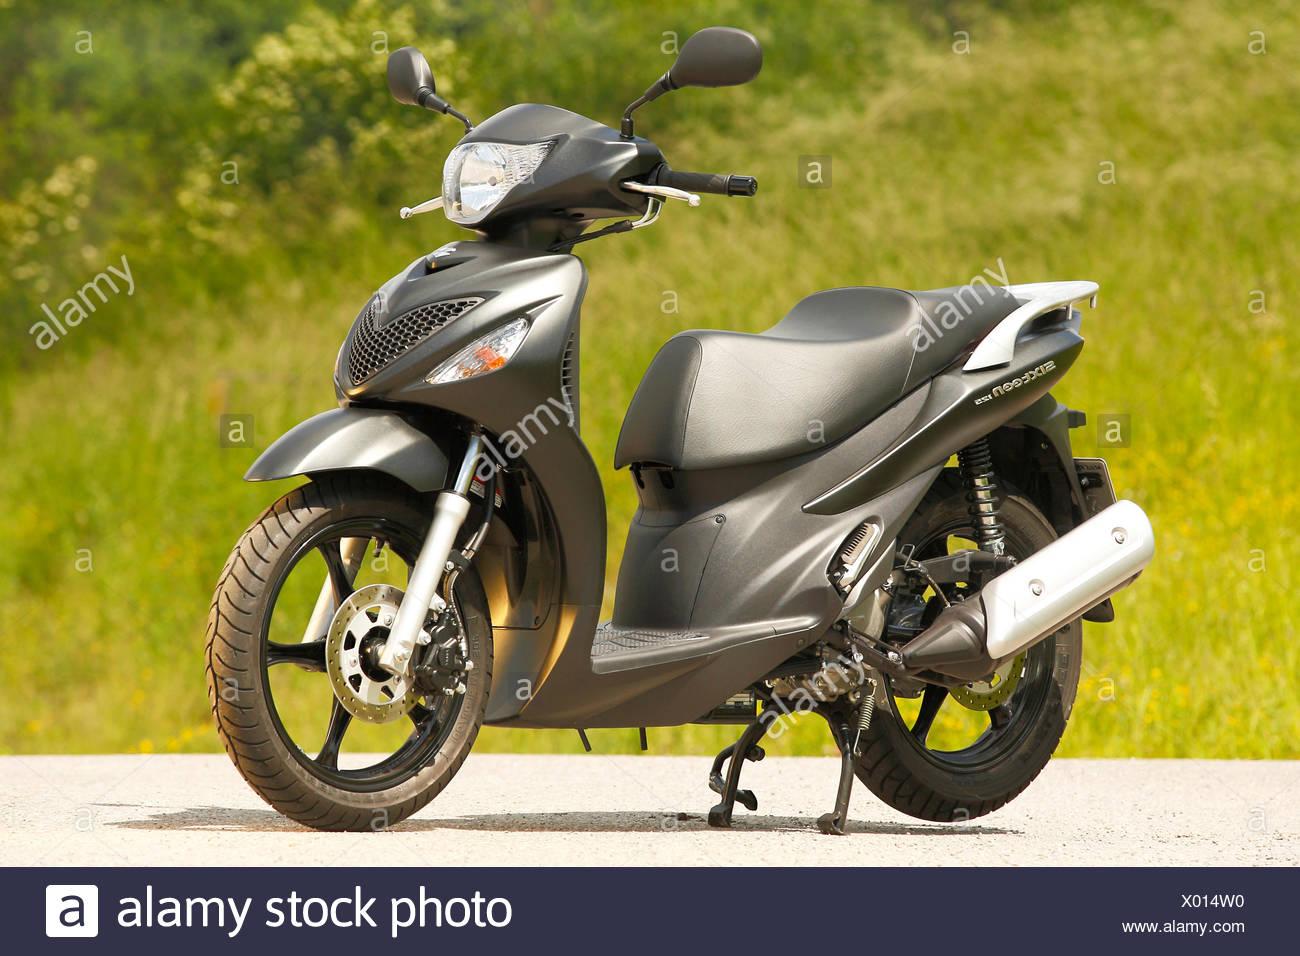 Suzuki Sixteen 125 scooter - Stock Image